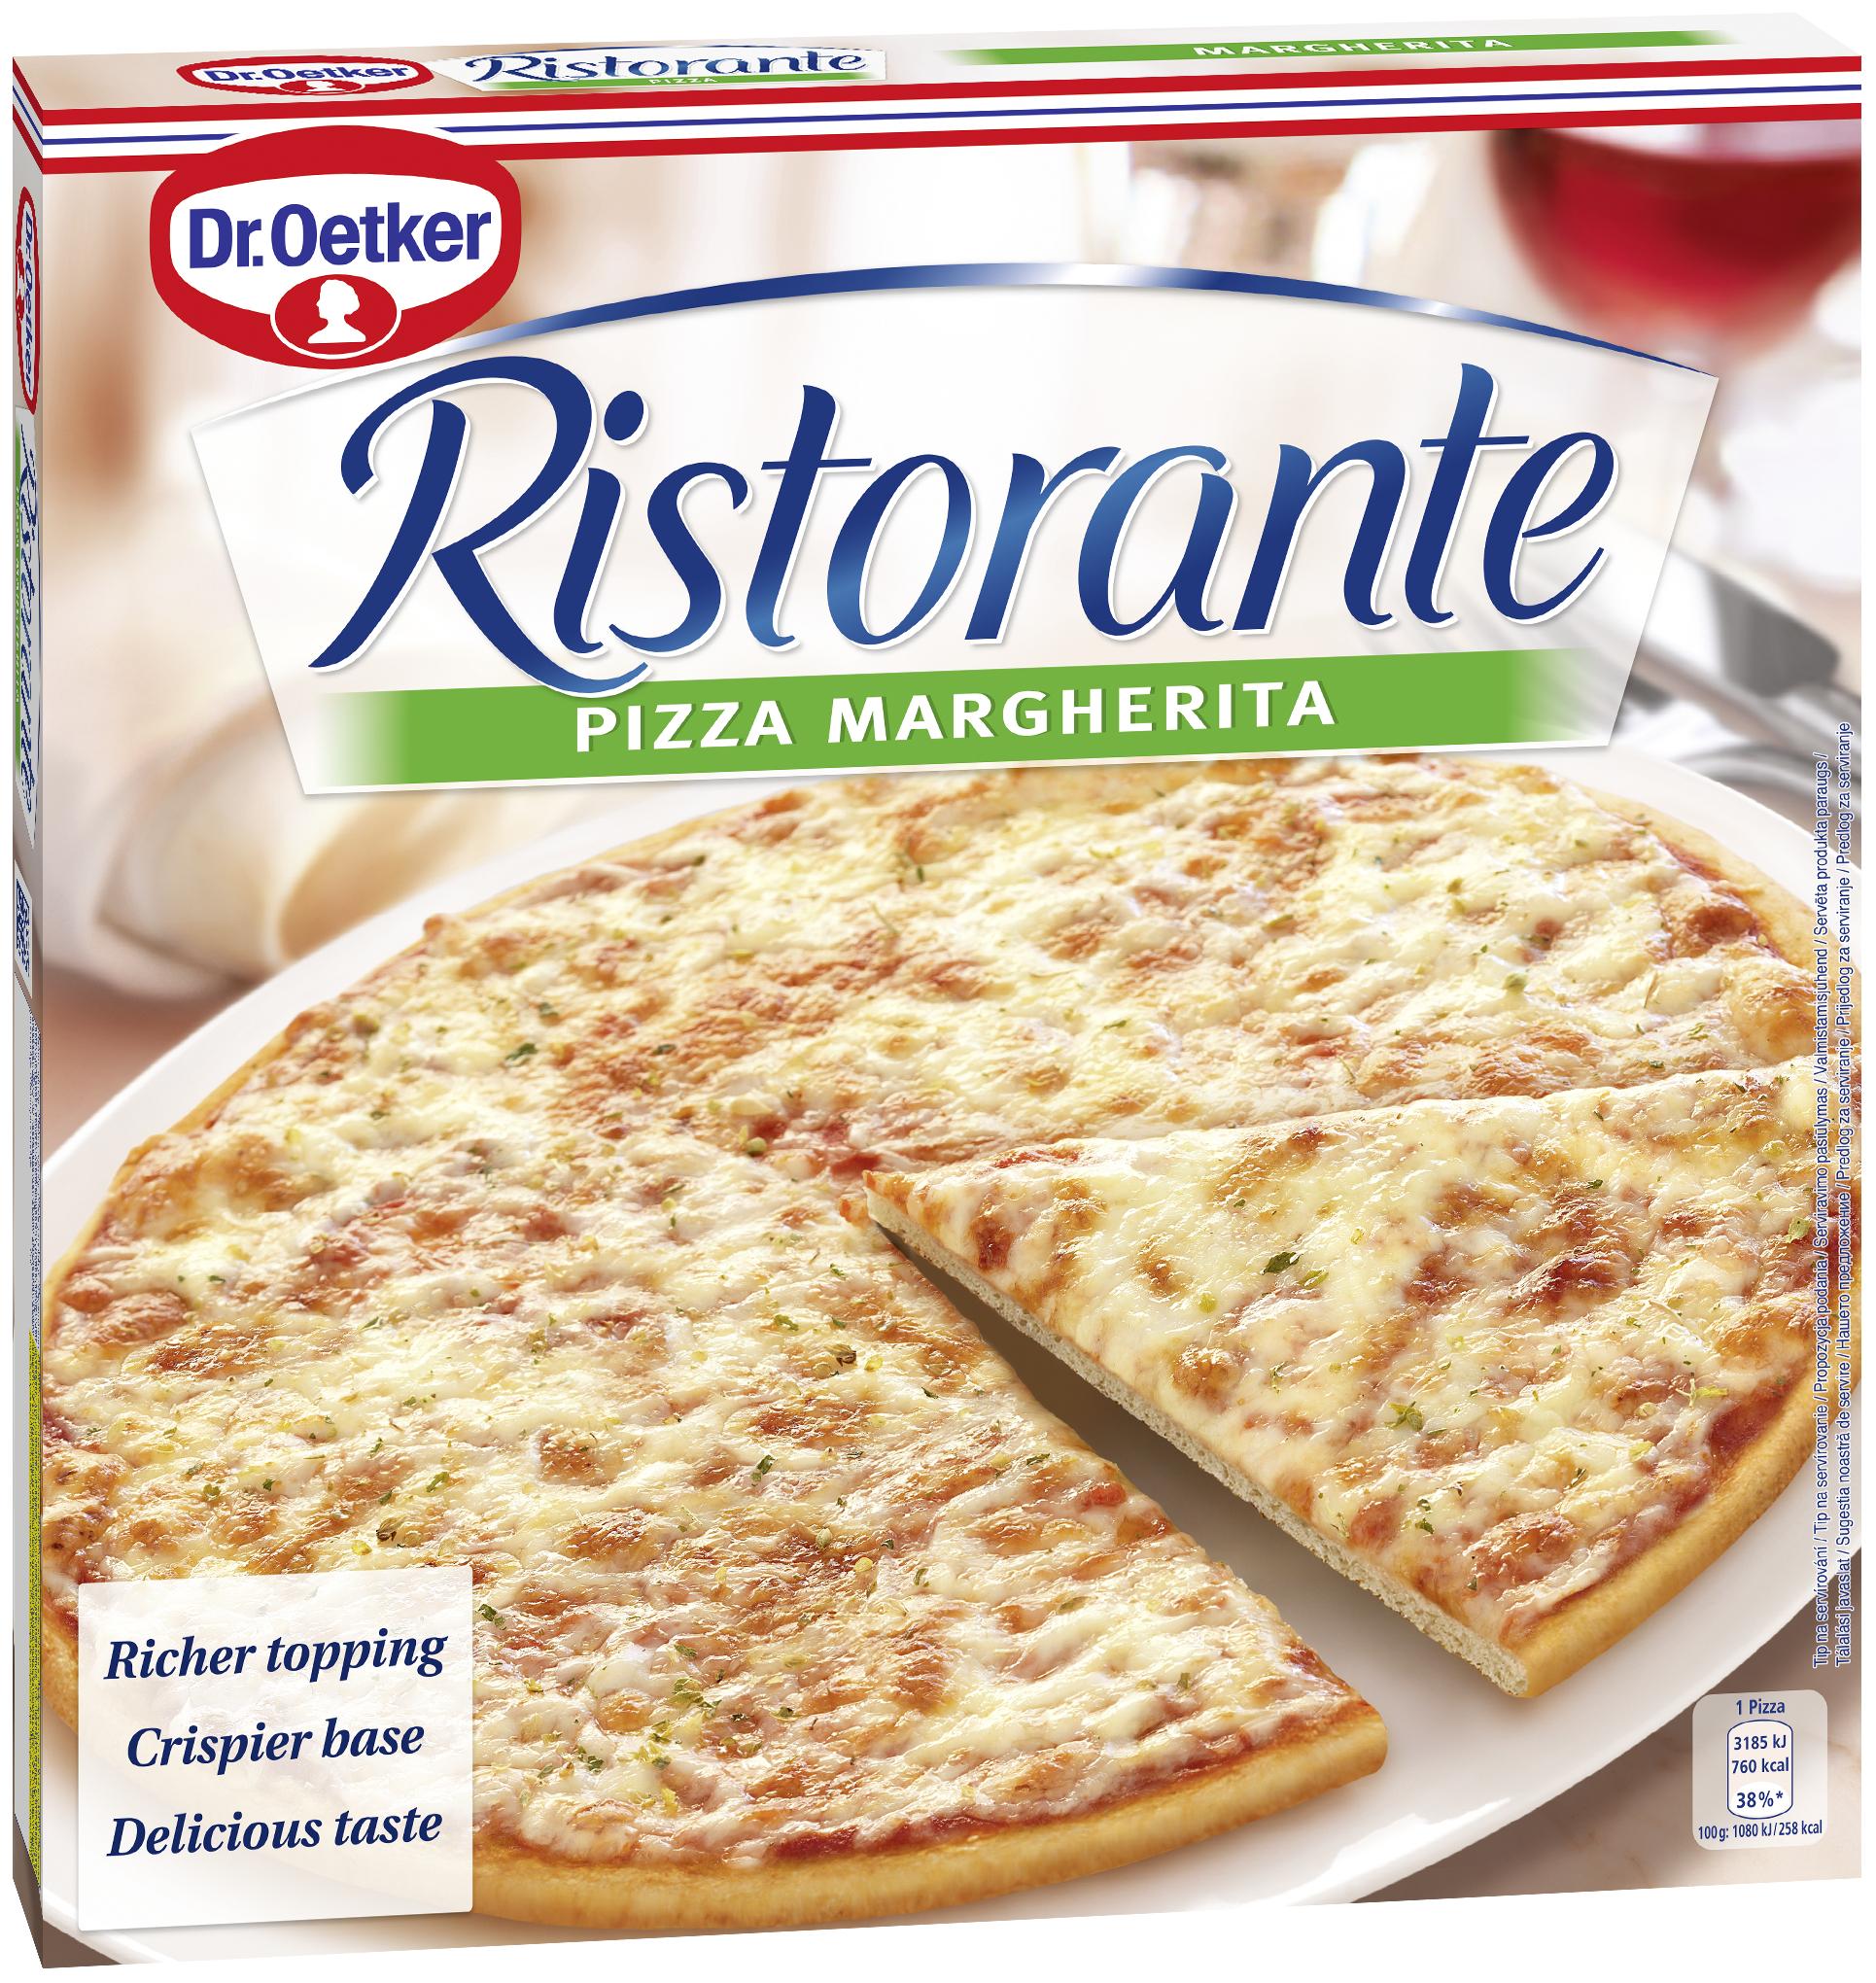 DR. OETKER Ristorante Margherita pizza